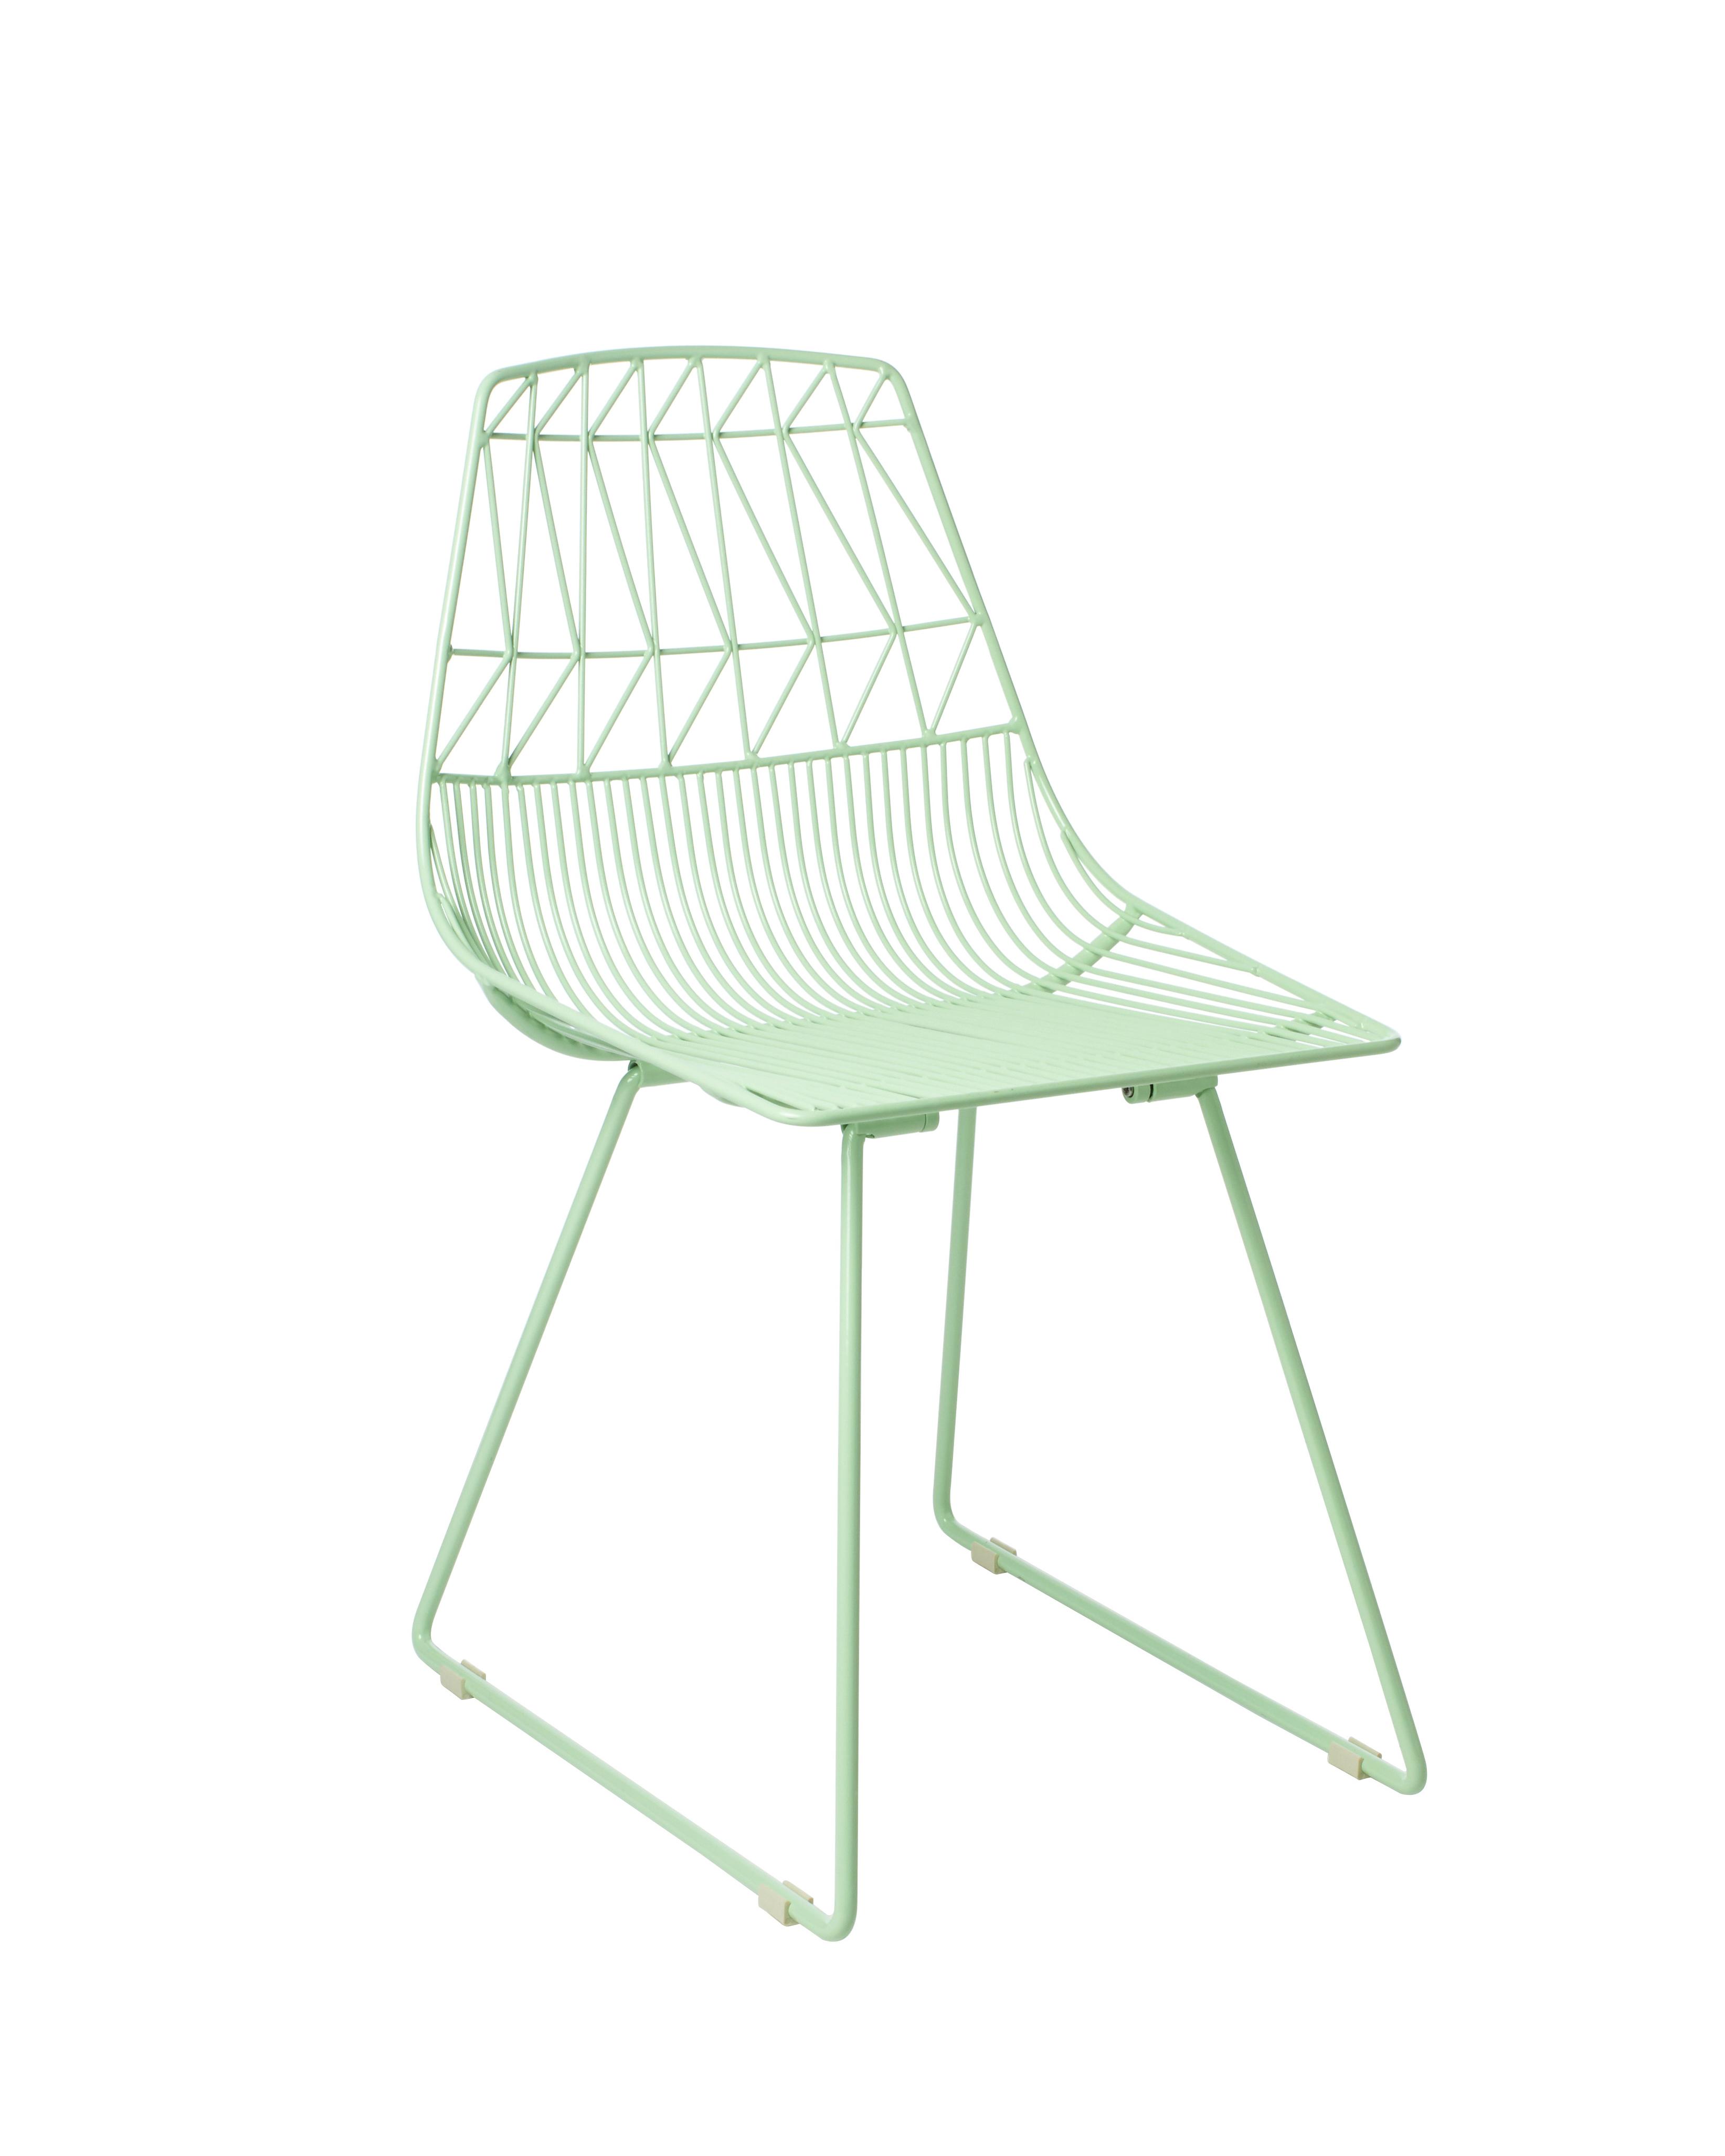 oudoor-registry-items-fab-lucy-chair-0814.jpg